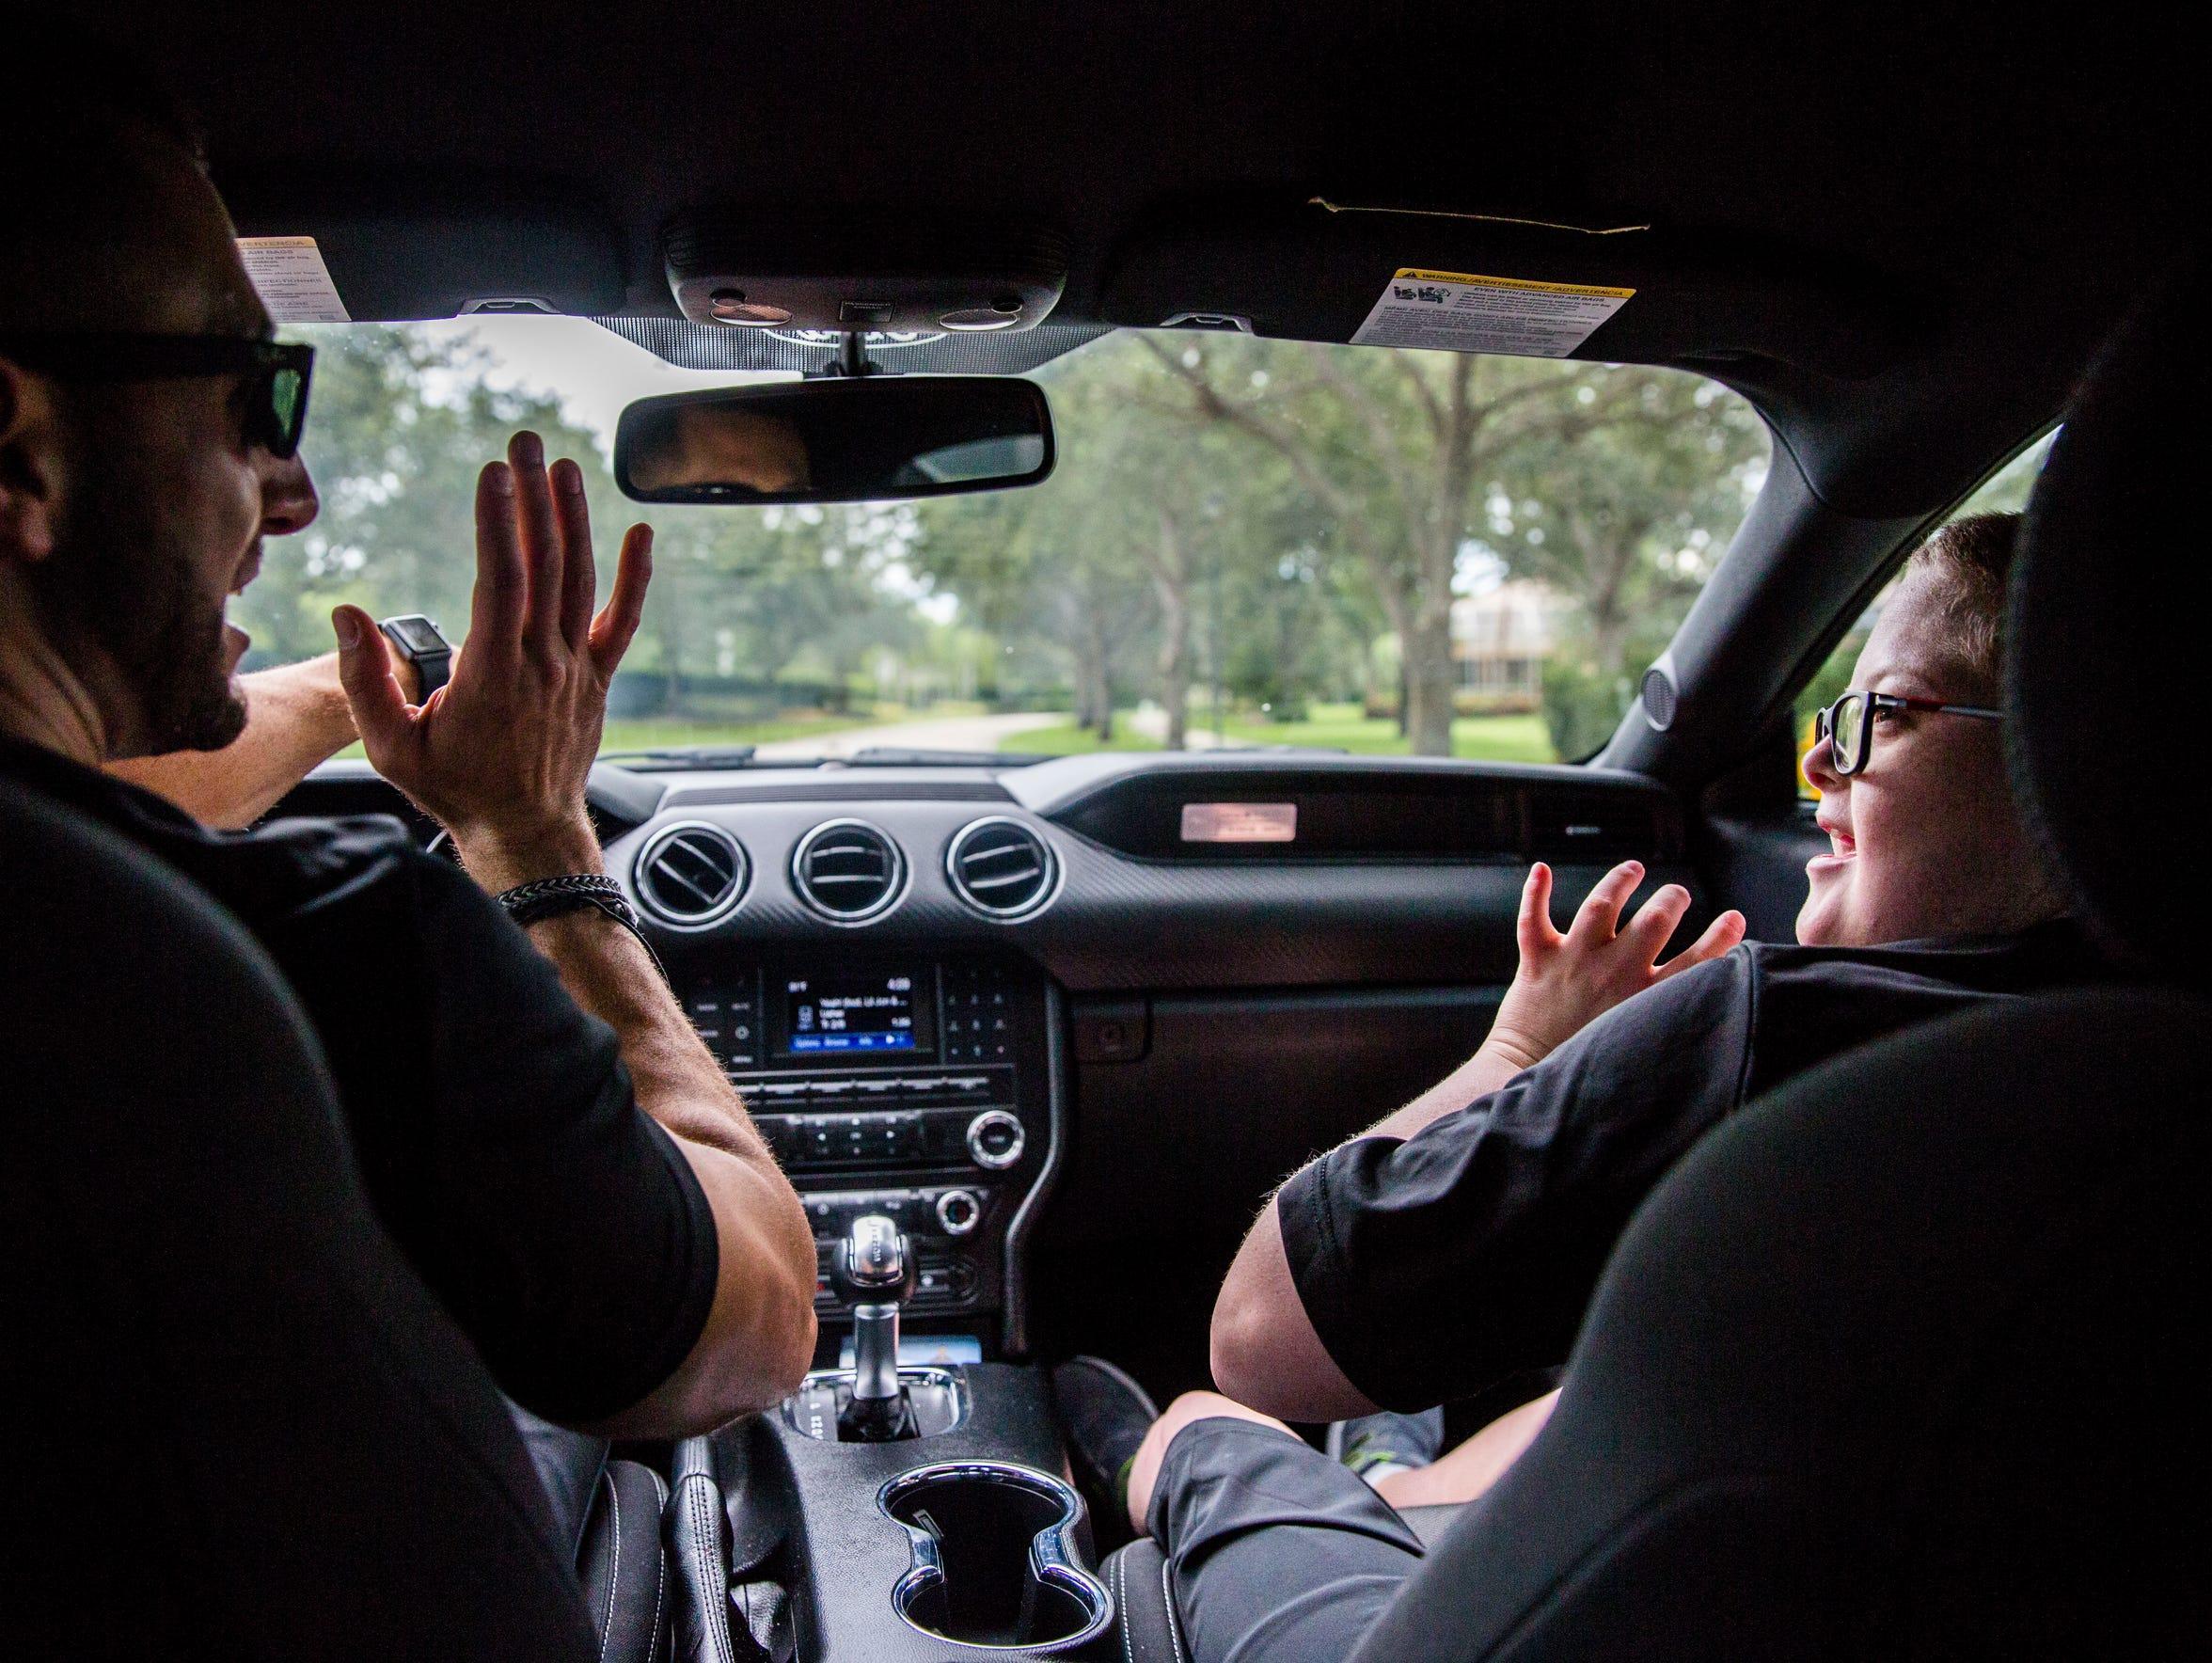 Personal trainer Sammy Callari dances in the car with